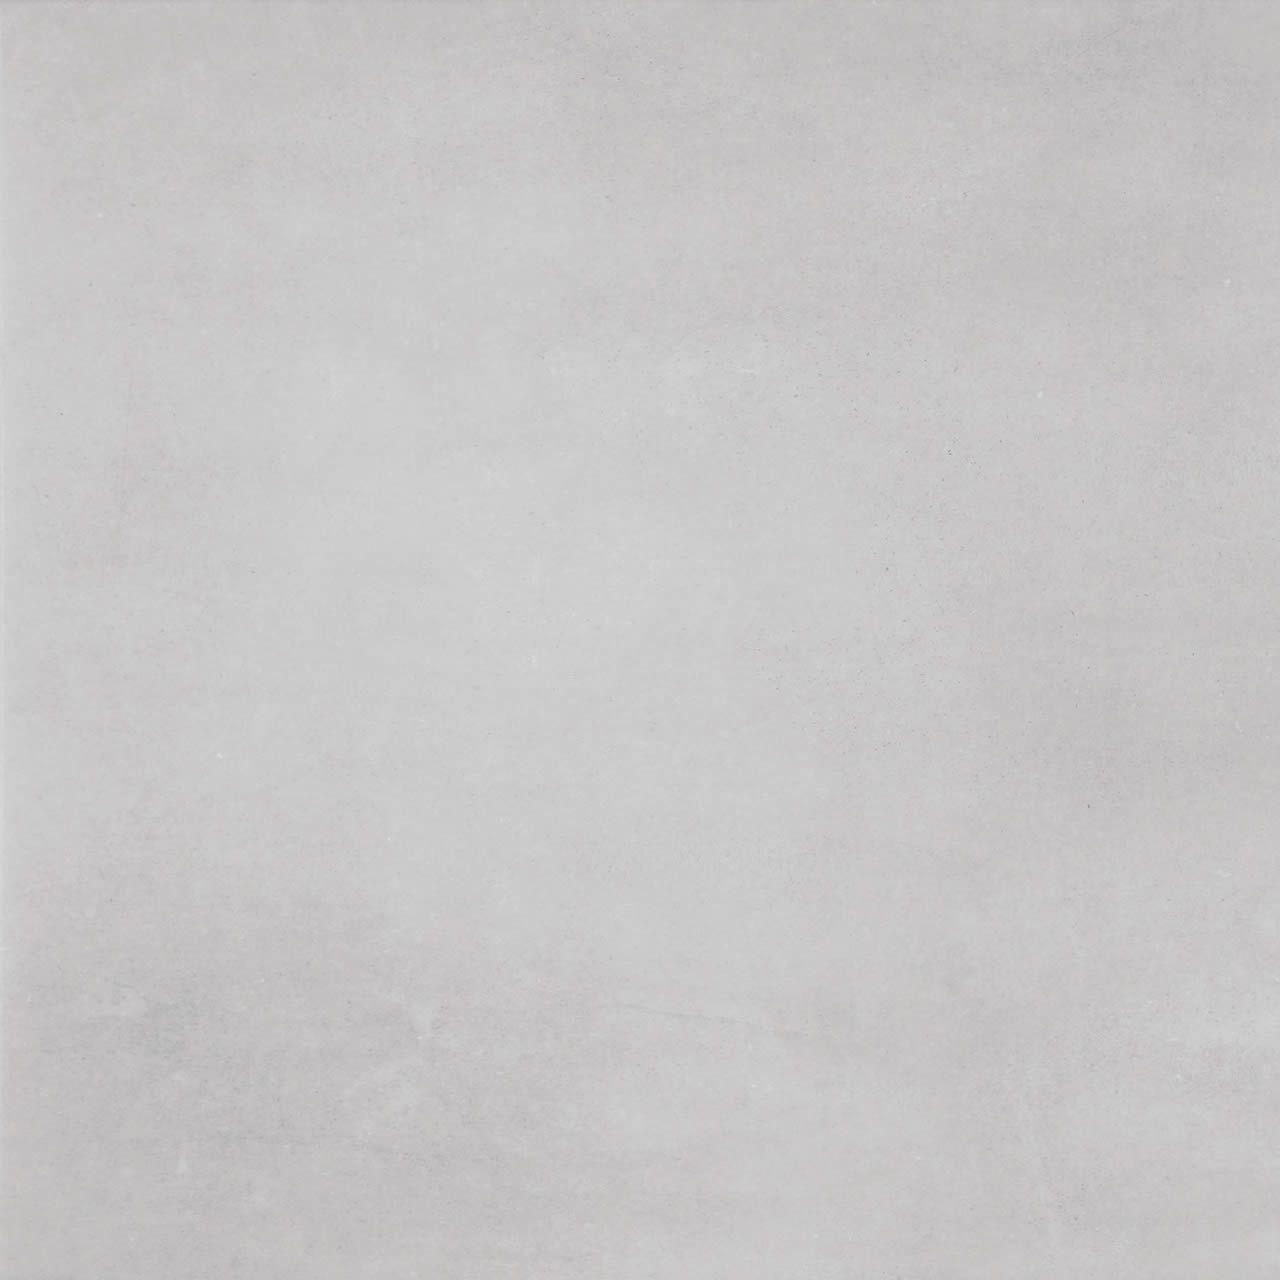 Porcelanato Acetinado Eliane Munari Cimento 90x90cm (C) Retificado